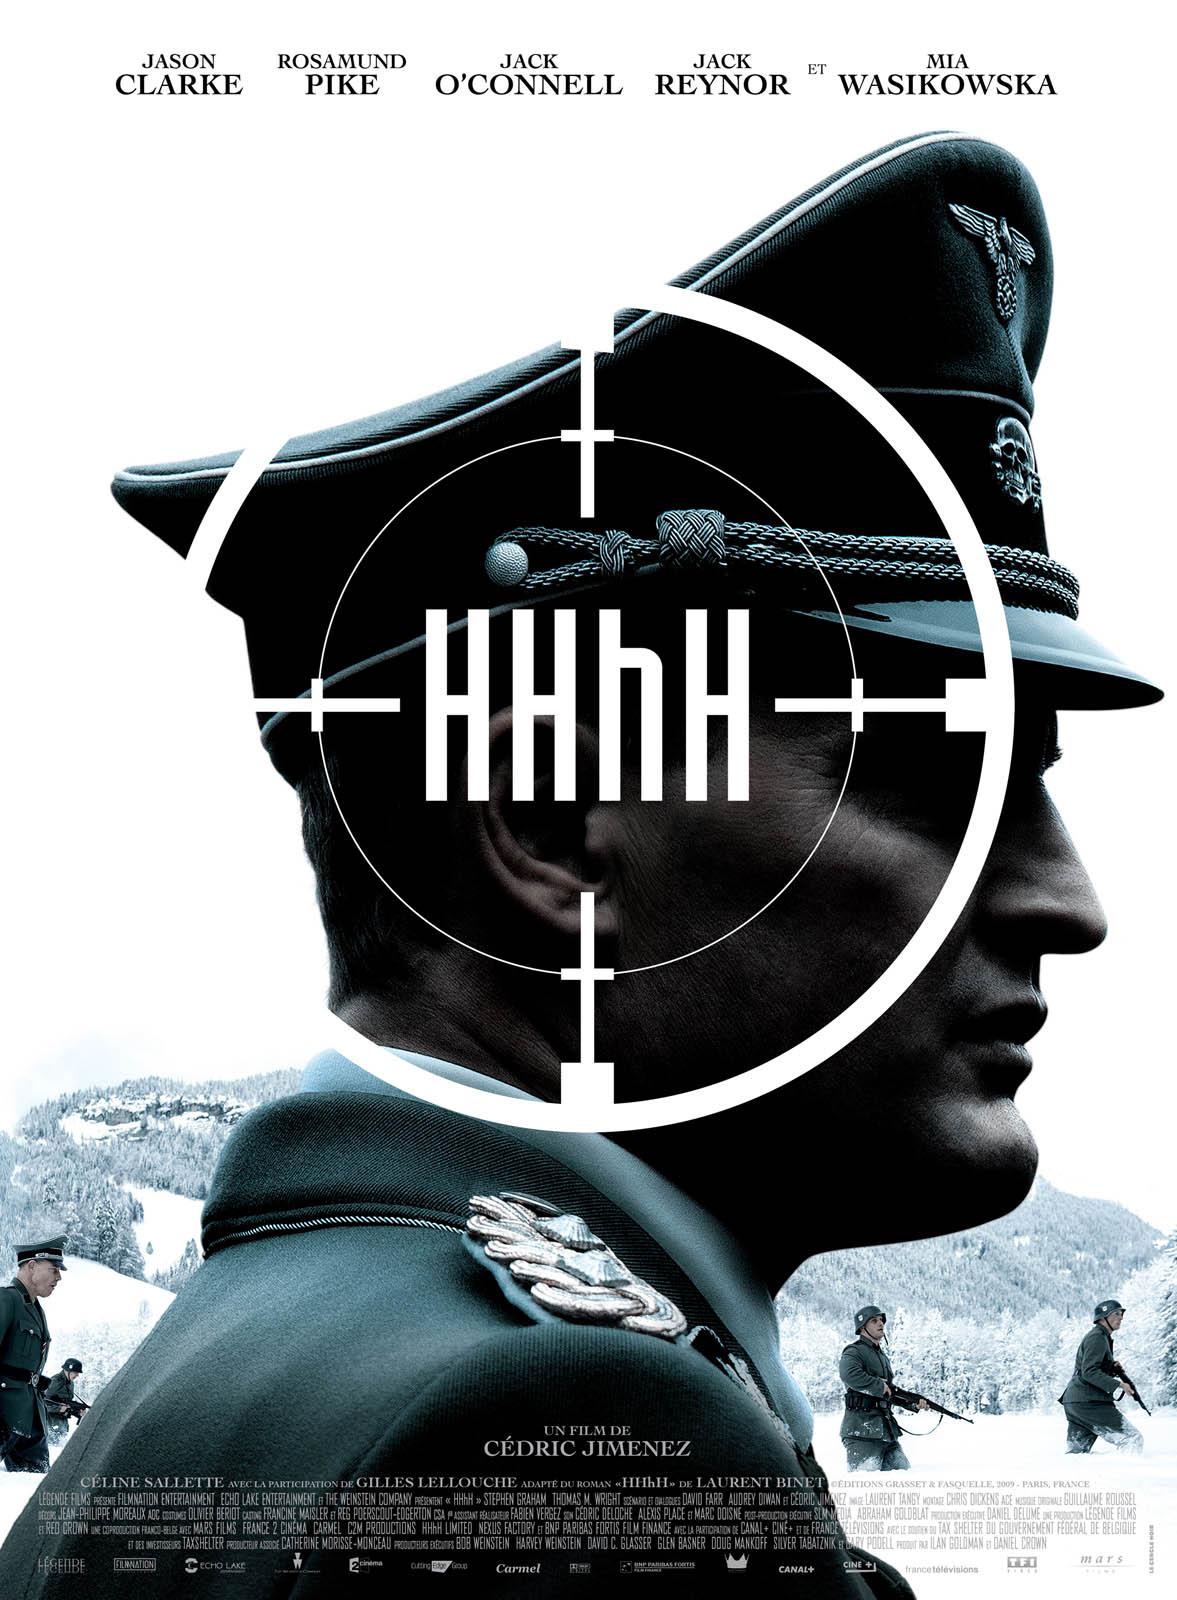 Télécharger HHhH HDLight 720p HD